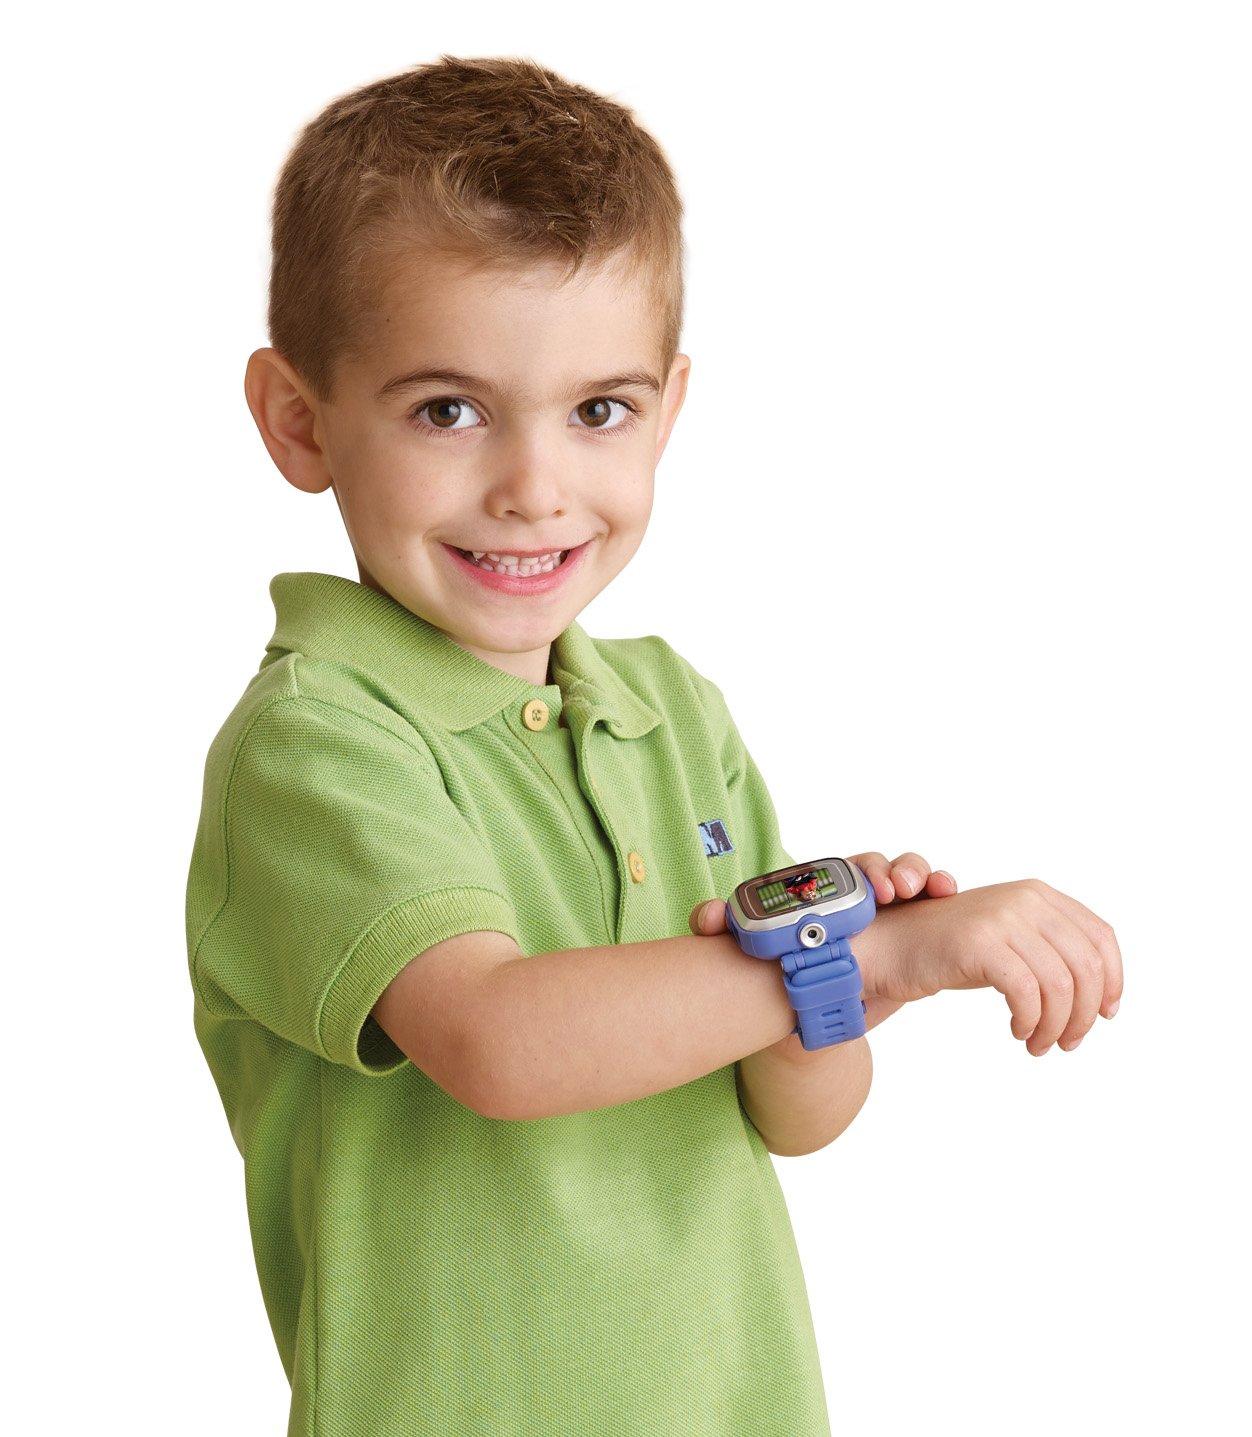 VTech Kidizoom Smartwatch, Blue (Discontinued by manufacturer) by VTech Kidizoom (Image #4)